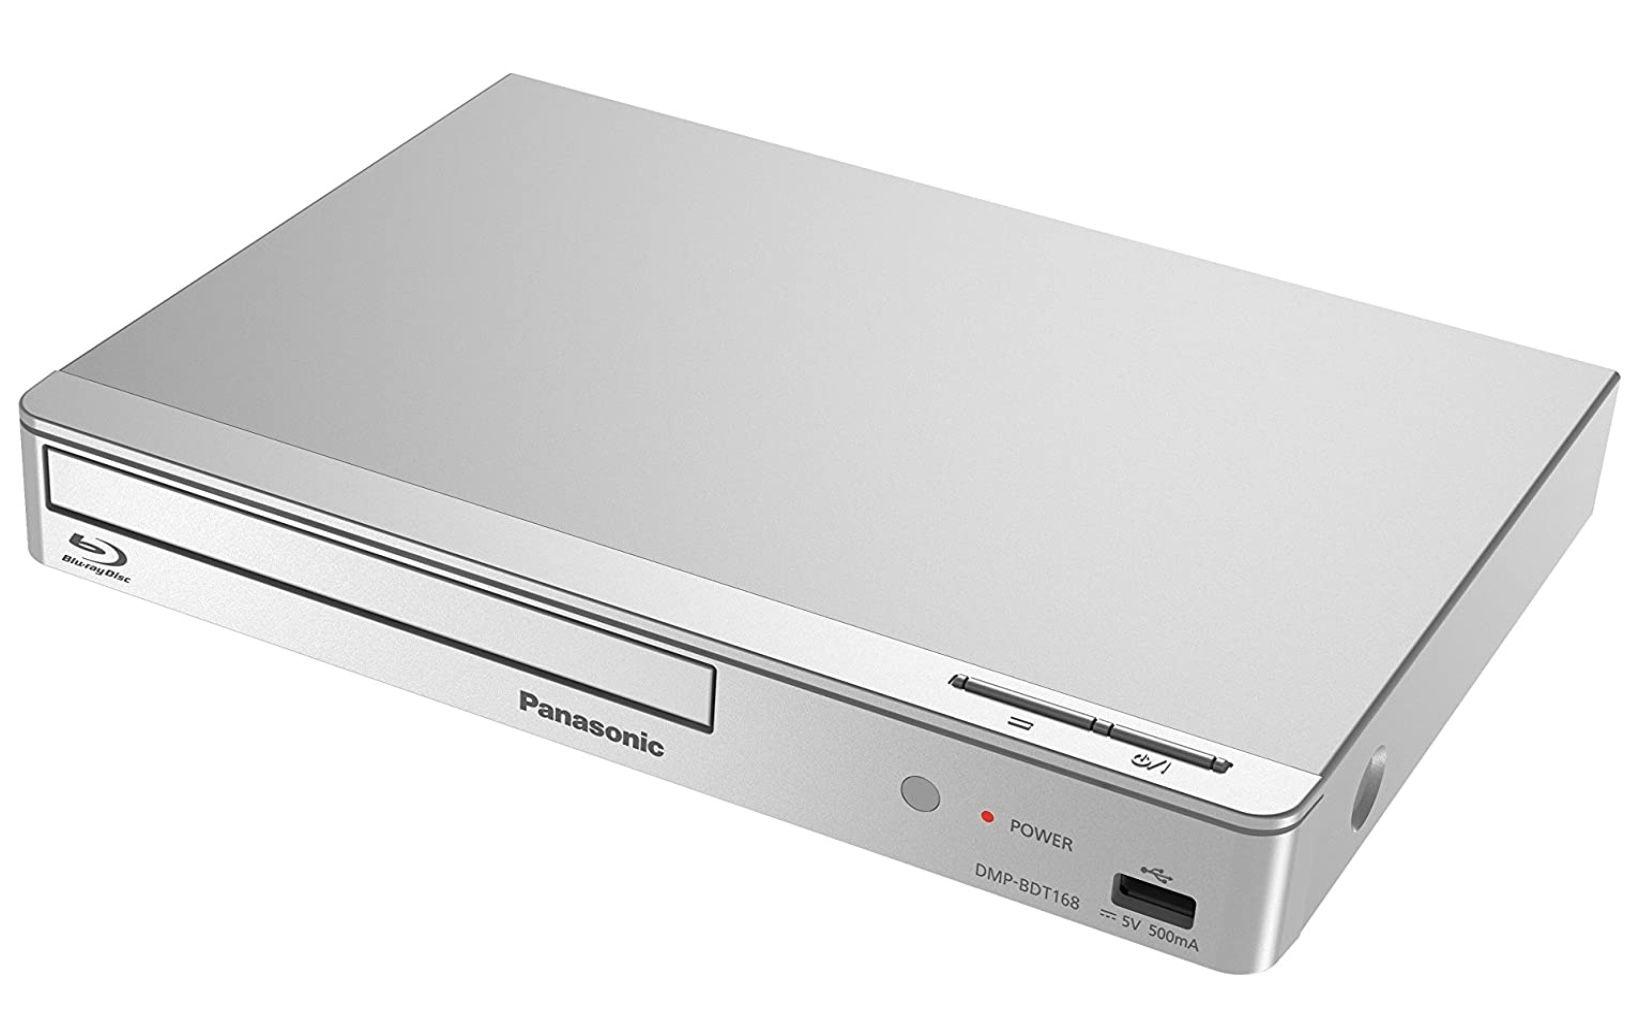 Panasonic DMP BDT168 Blu ray Player in Silber für 54,89€ (statt 66€)